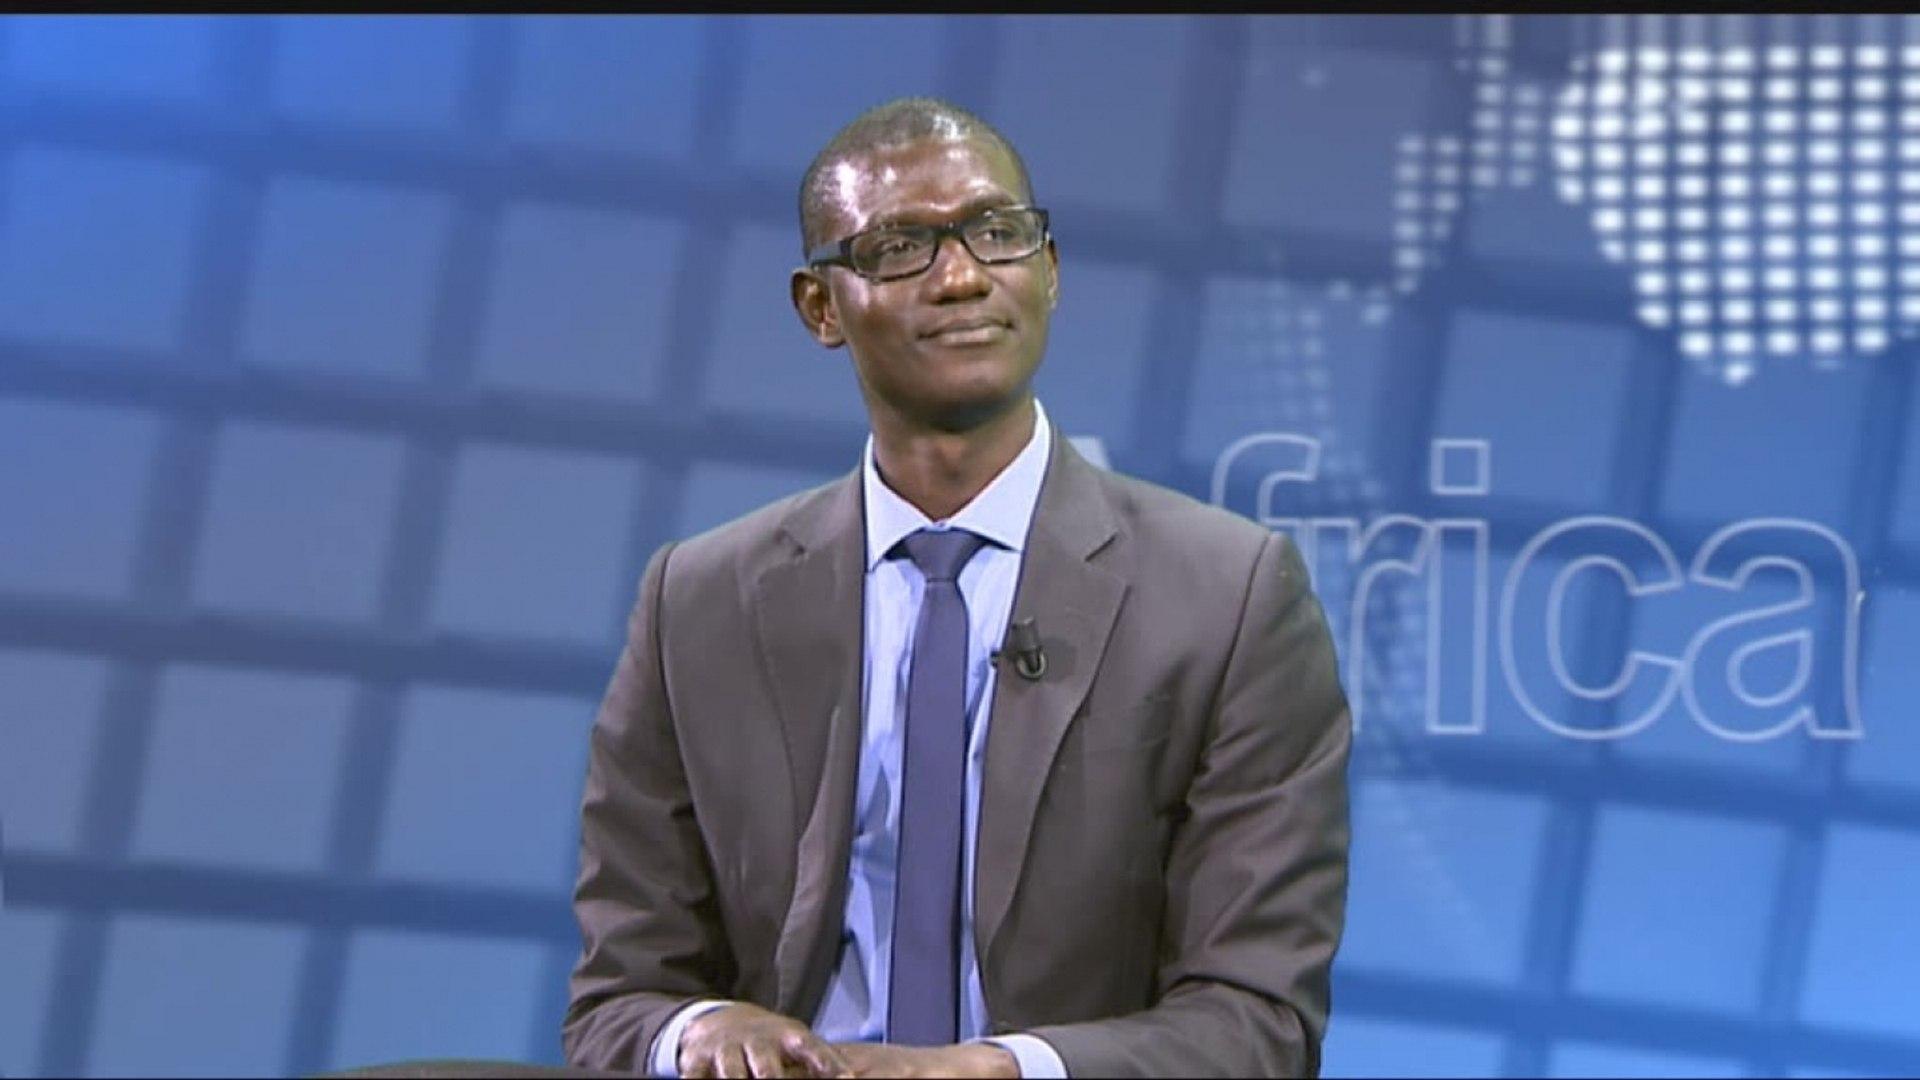 AFRICA NEWS ROOM - Bénin : Moderniser l'administration pour la rendre performante (2/3)